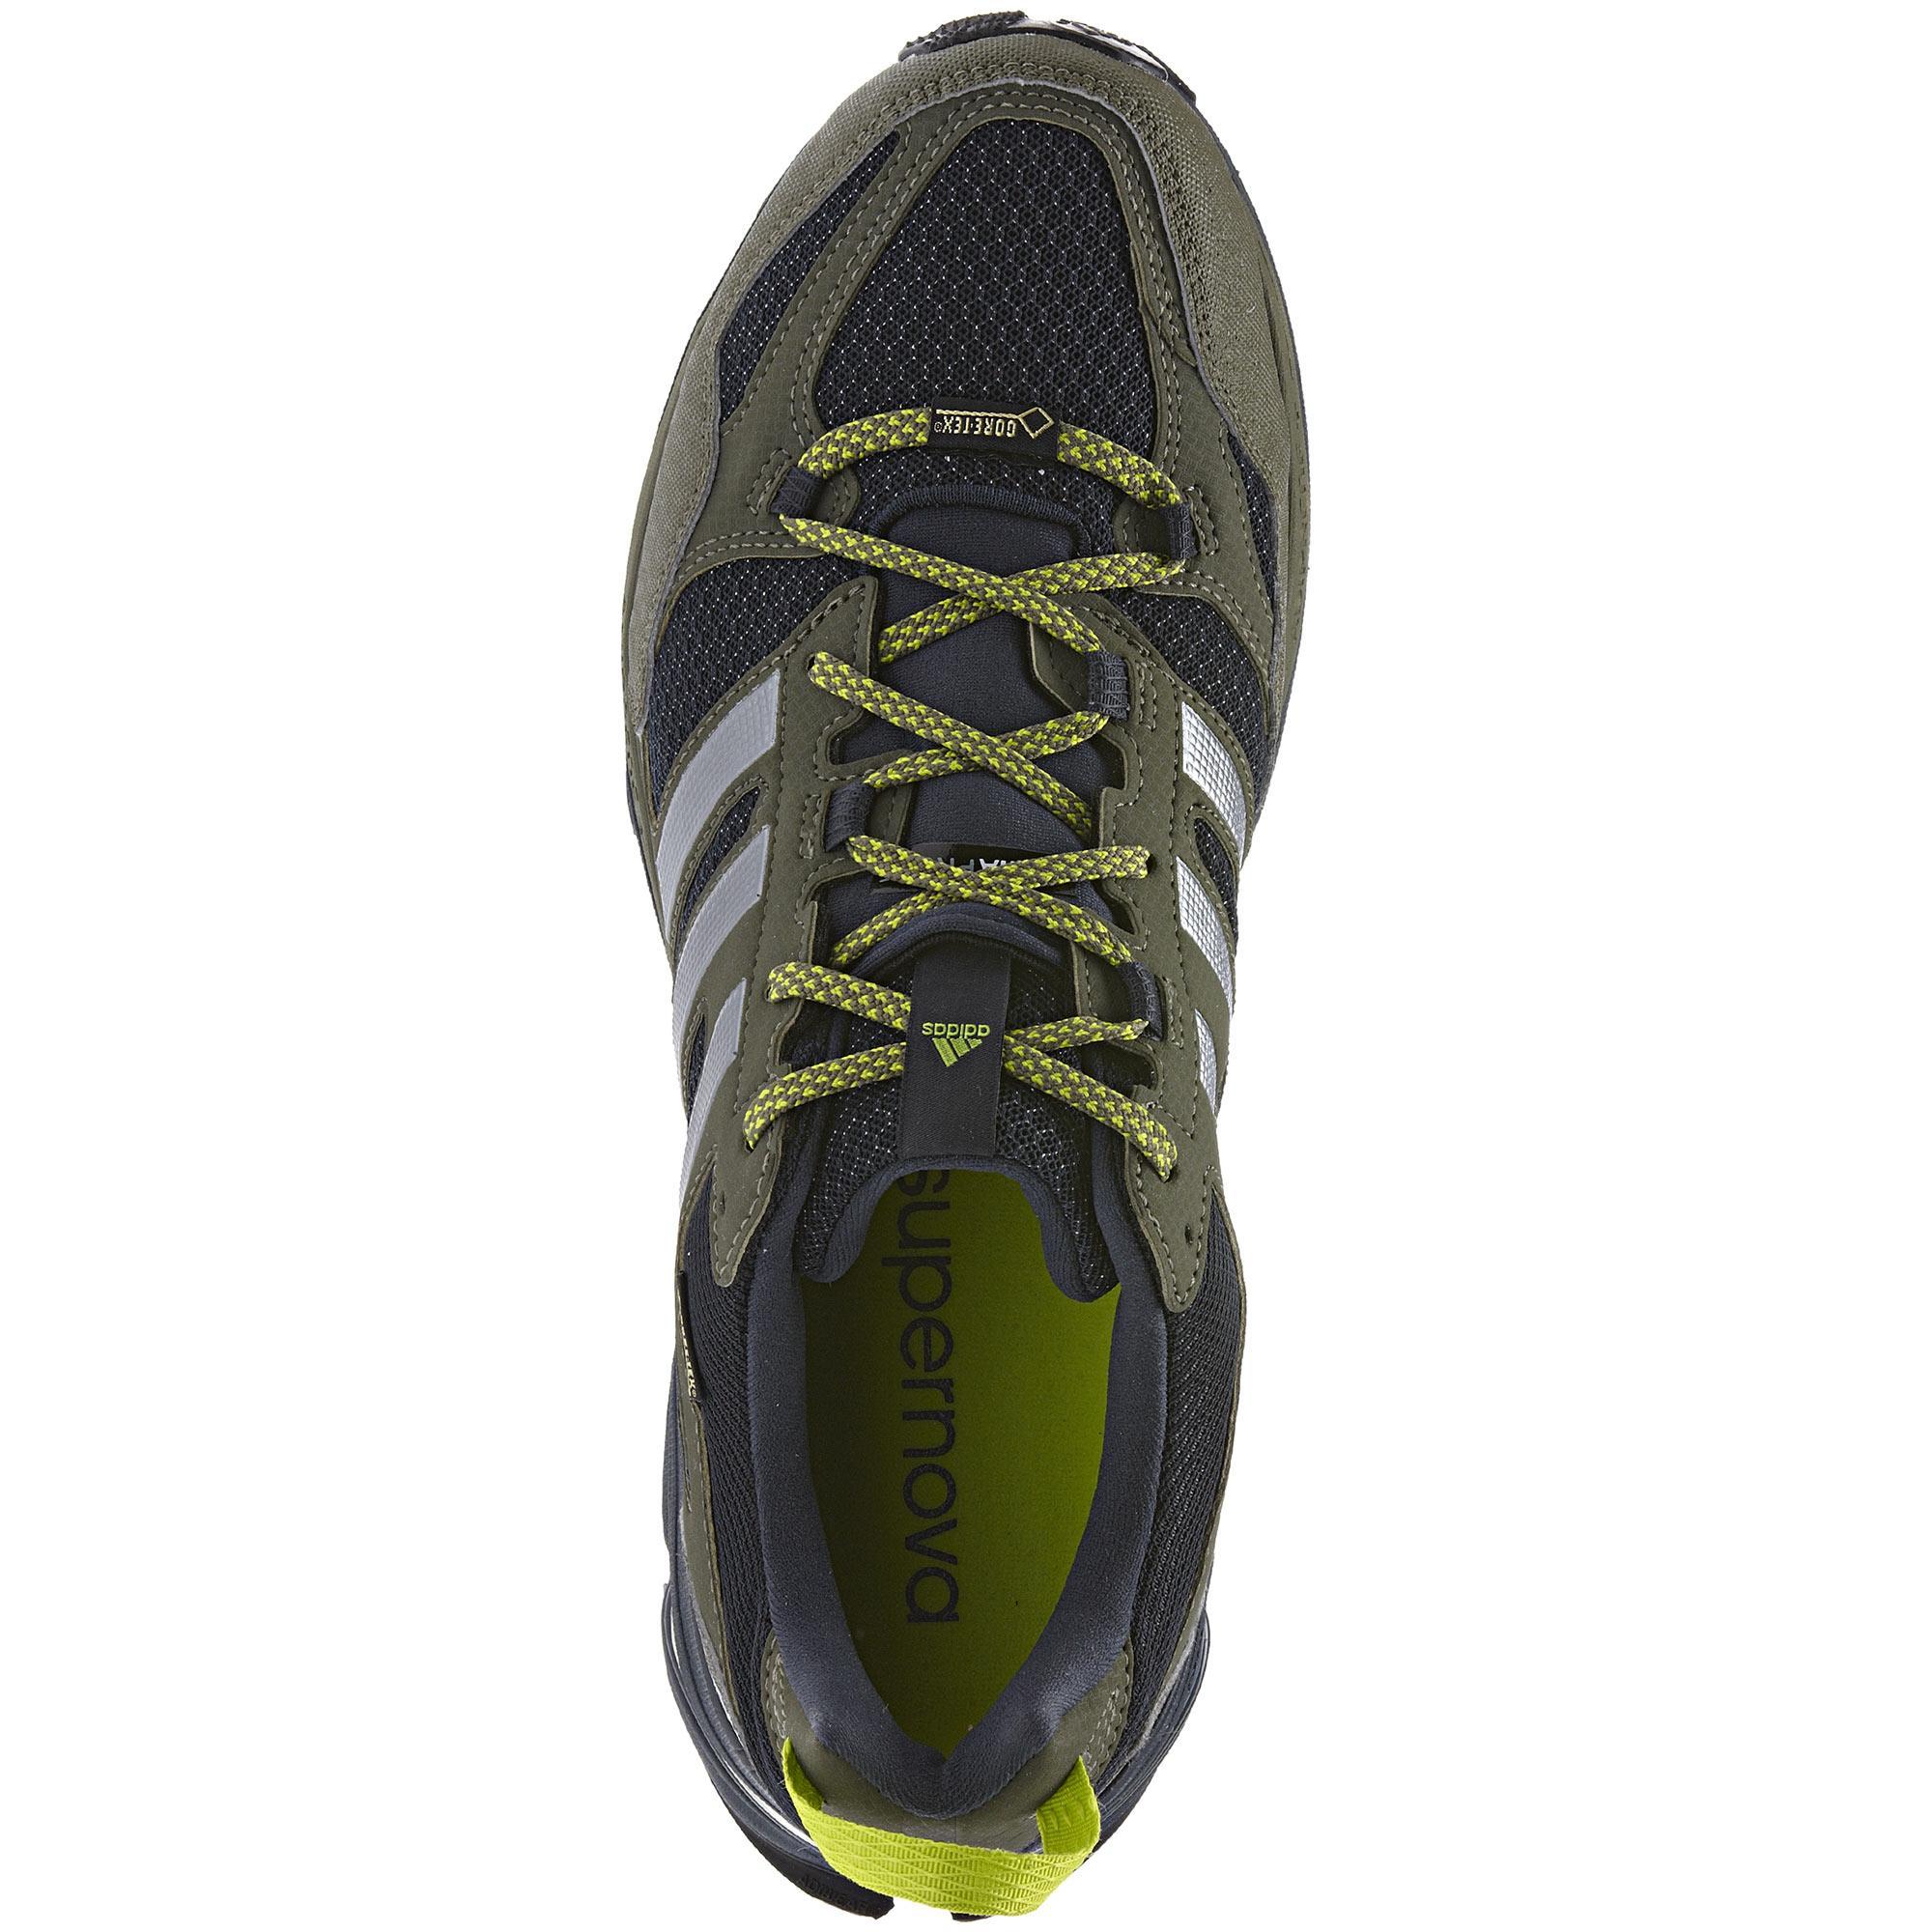 1577002be51e1 Adidas Mens Supernova Riot 5 GTX Running Shoes - Green - Tennisnuts.com